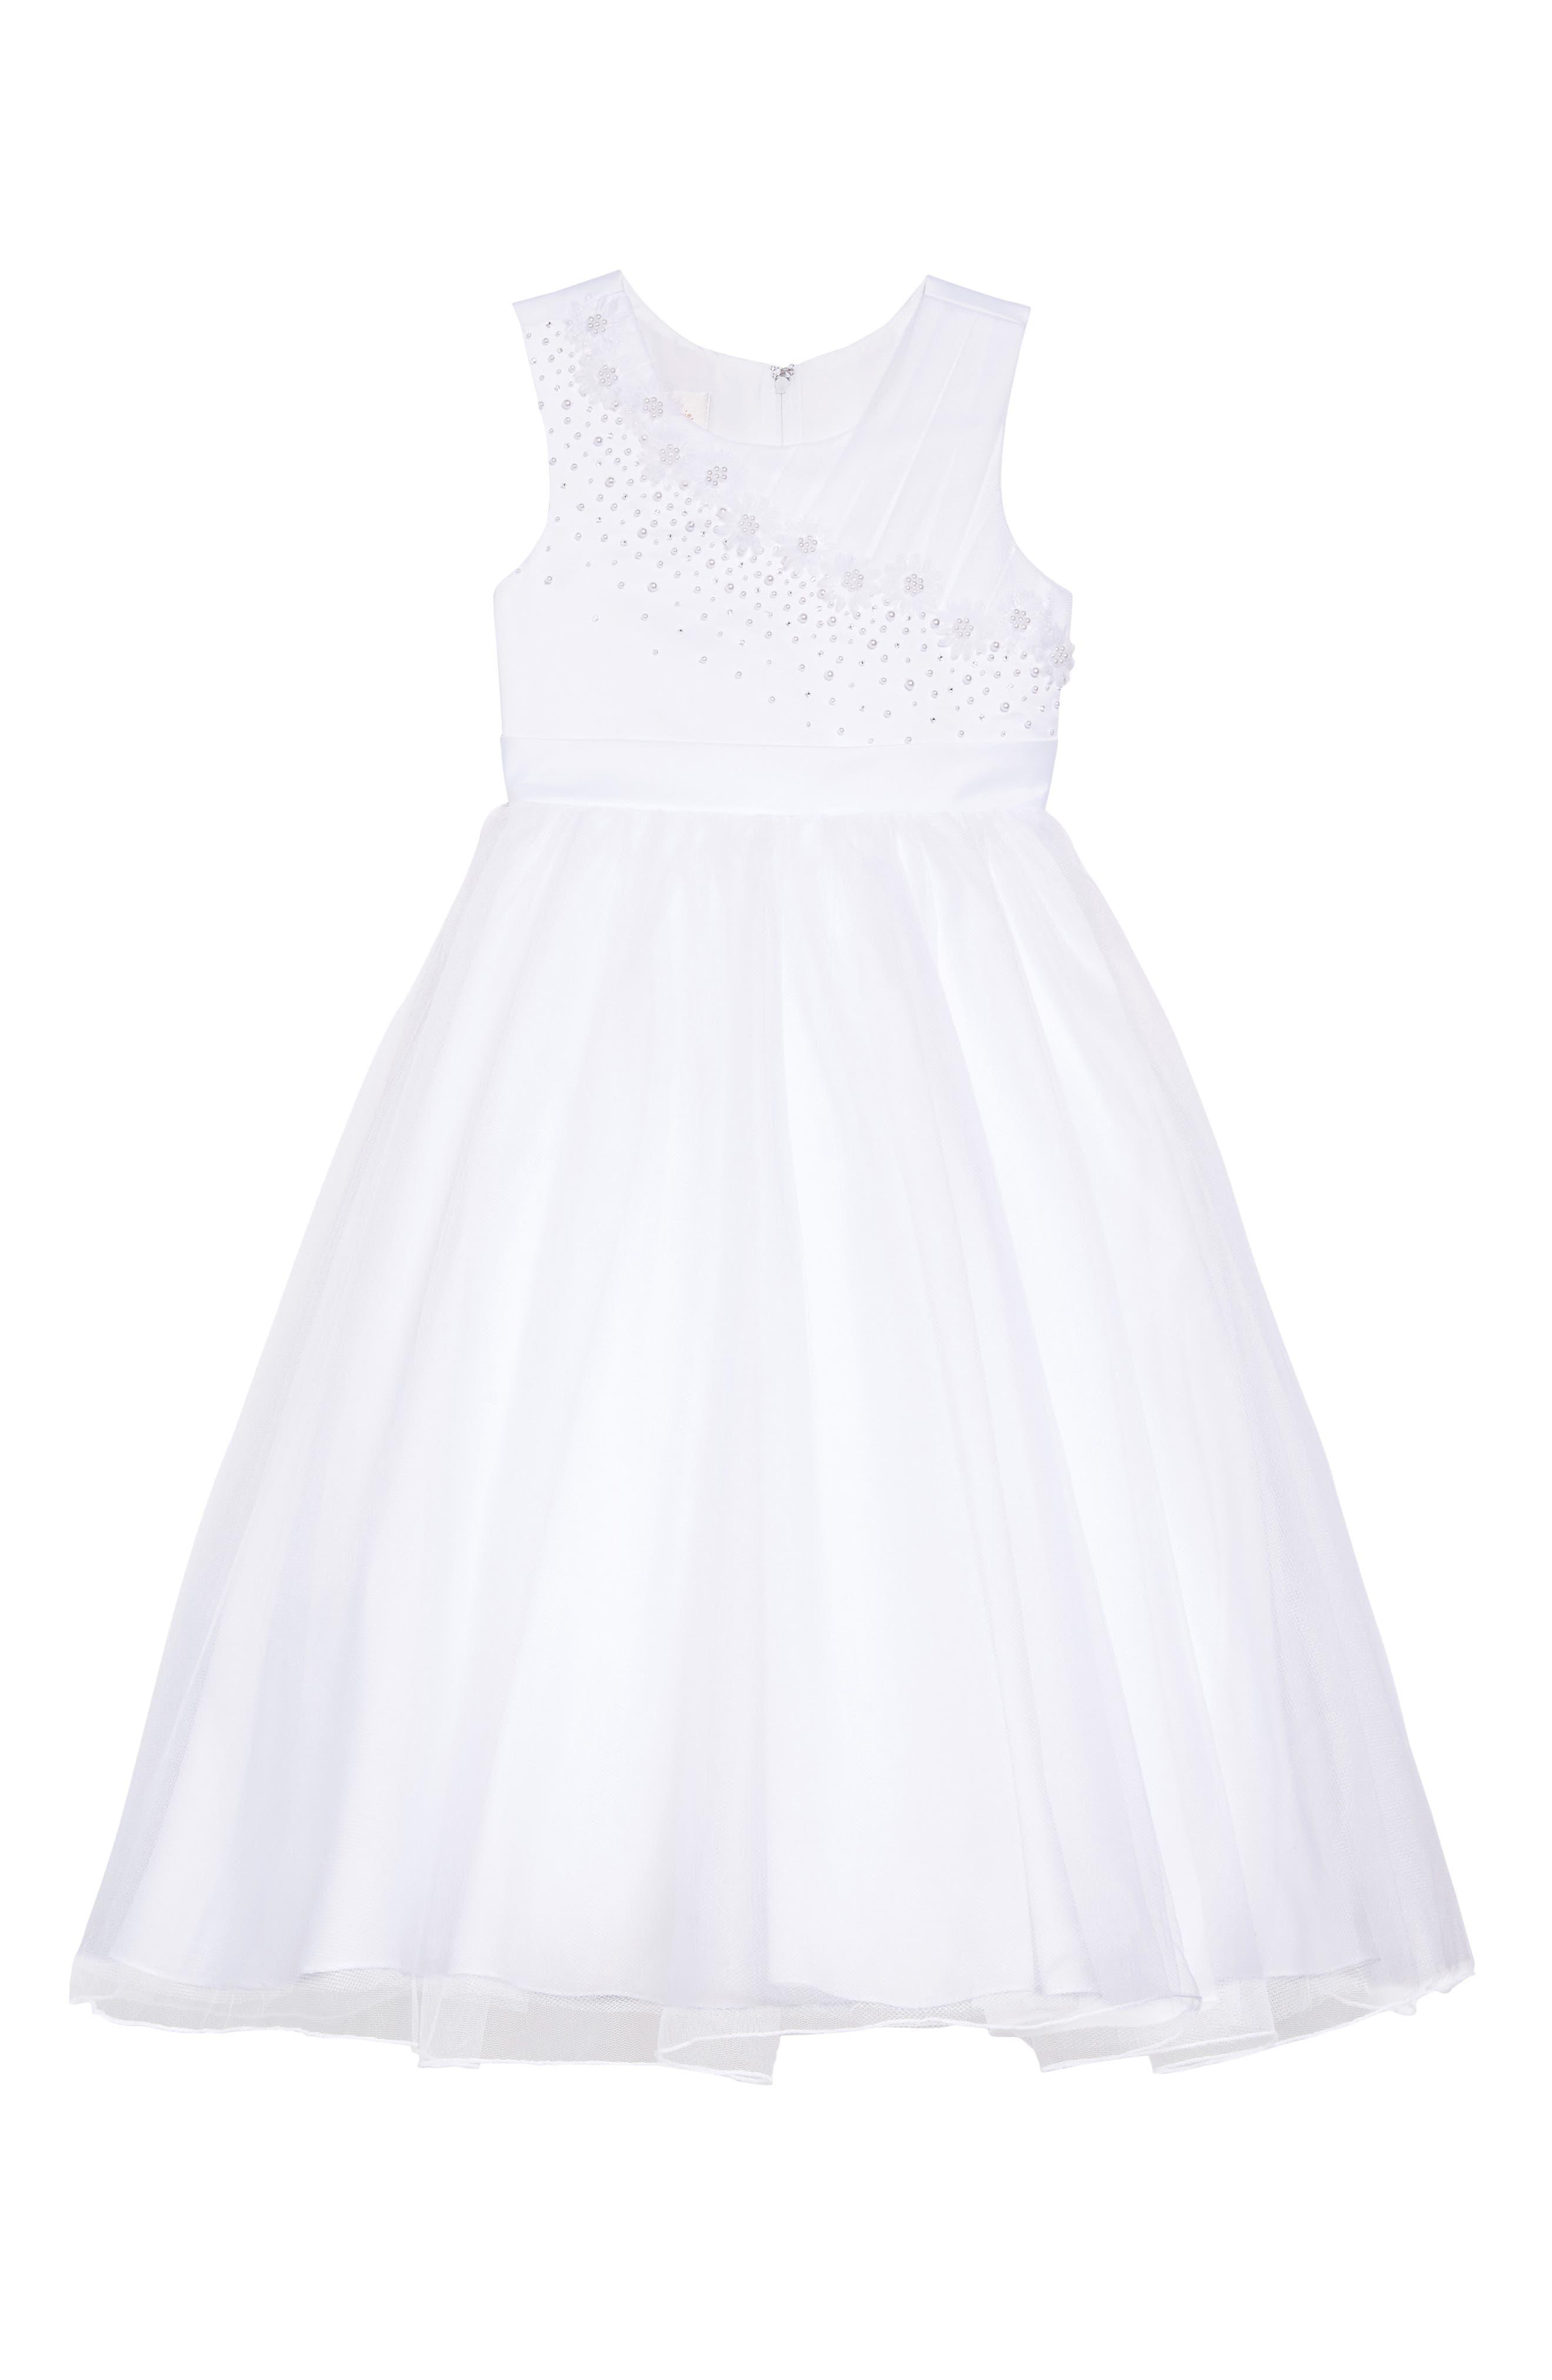 LAUREN MARIE Imitation Pearl Tulle Dress, Main, color, WHITE